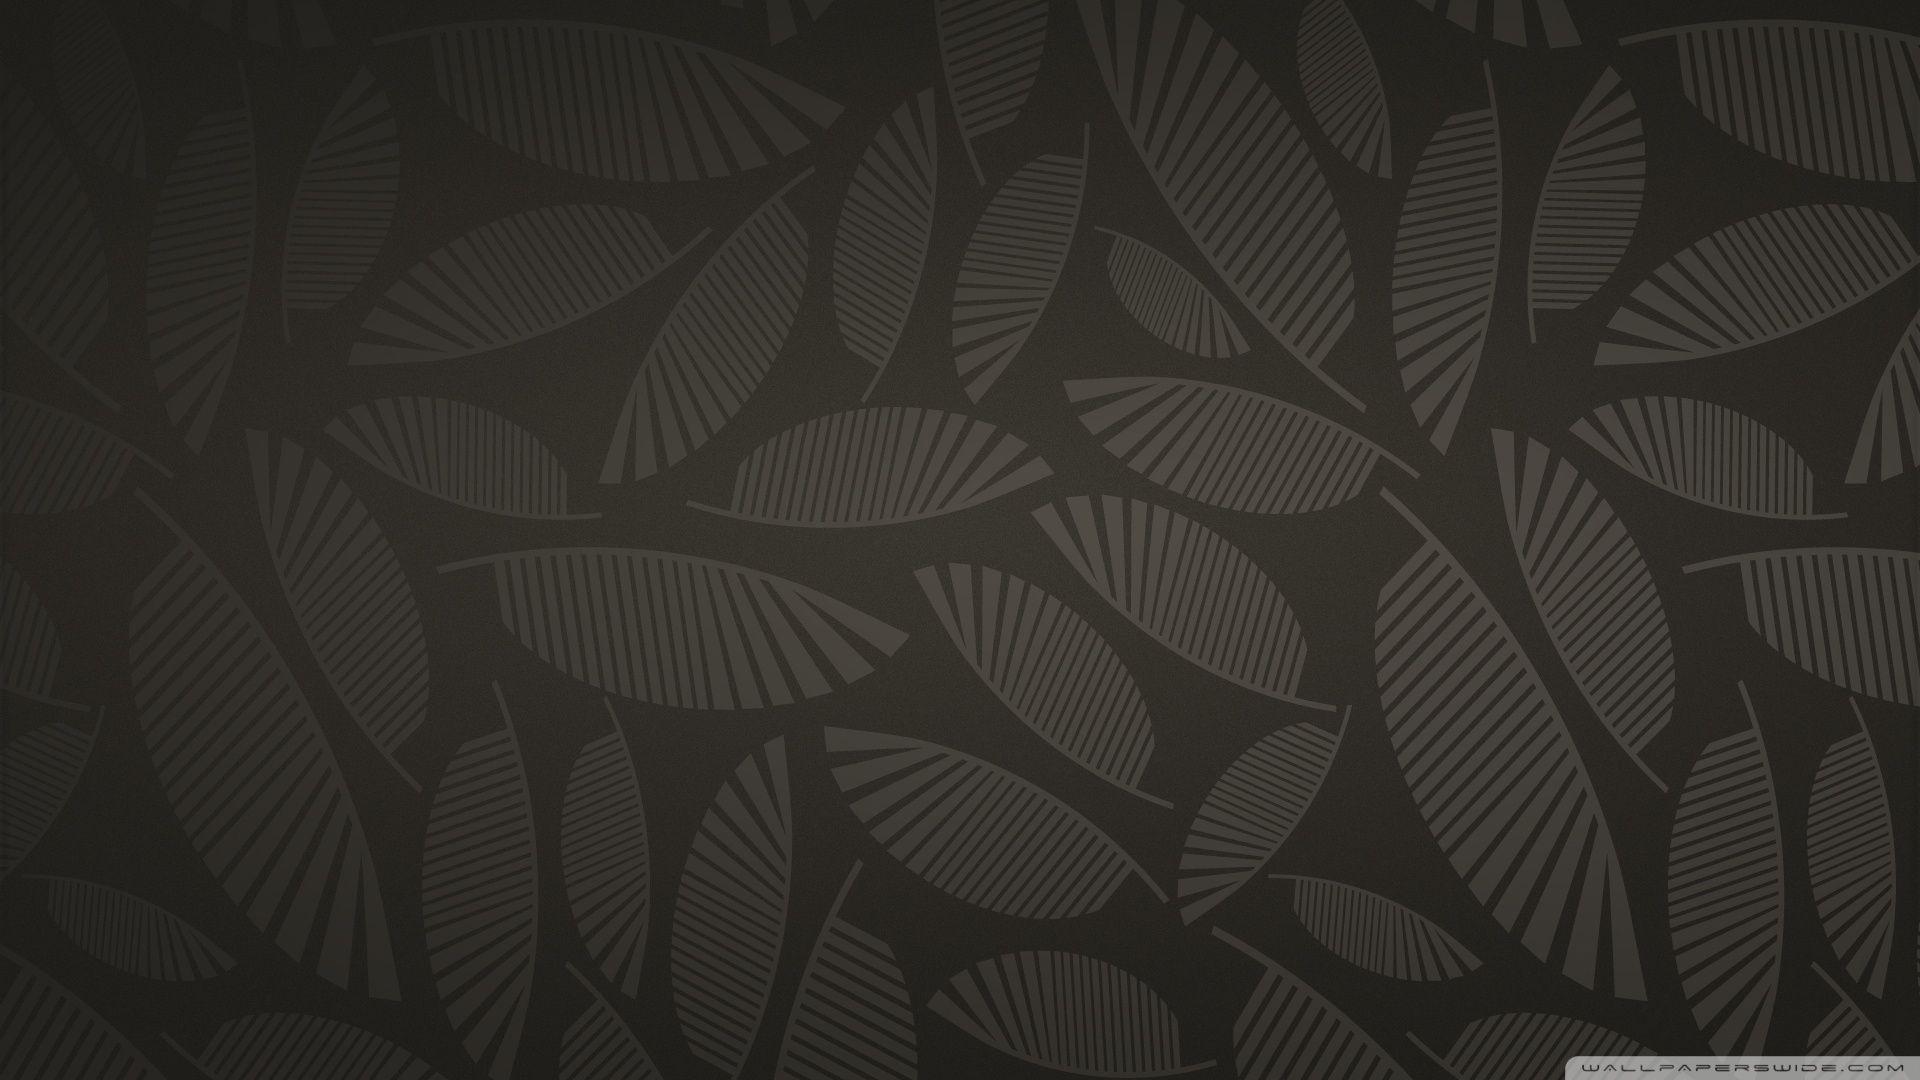 Ginkgo trees wallpaper high definition high quality widescreen - Leaves Pattern Hd Desktop Wallpaper Widescreen High Definition